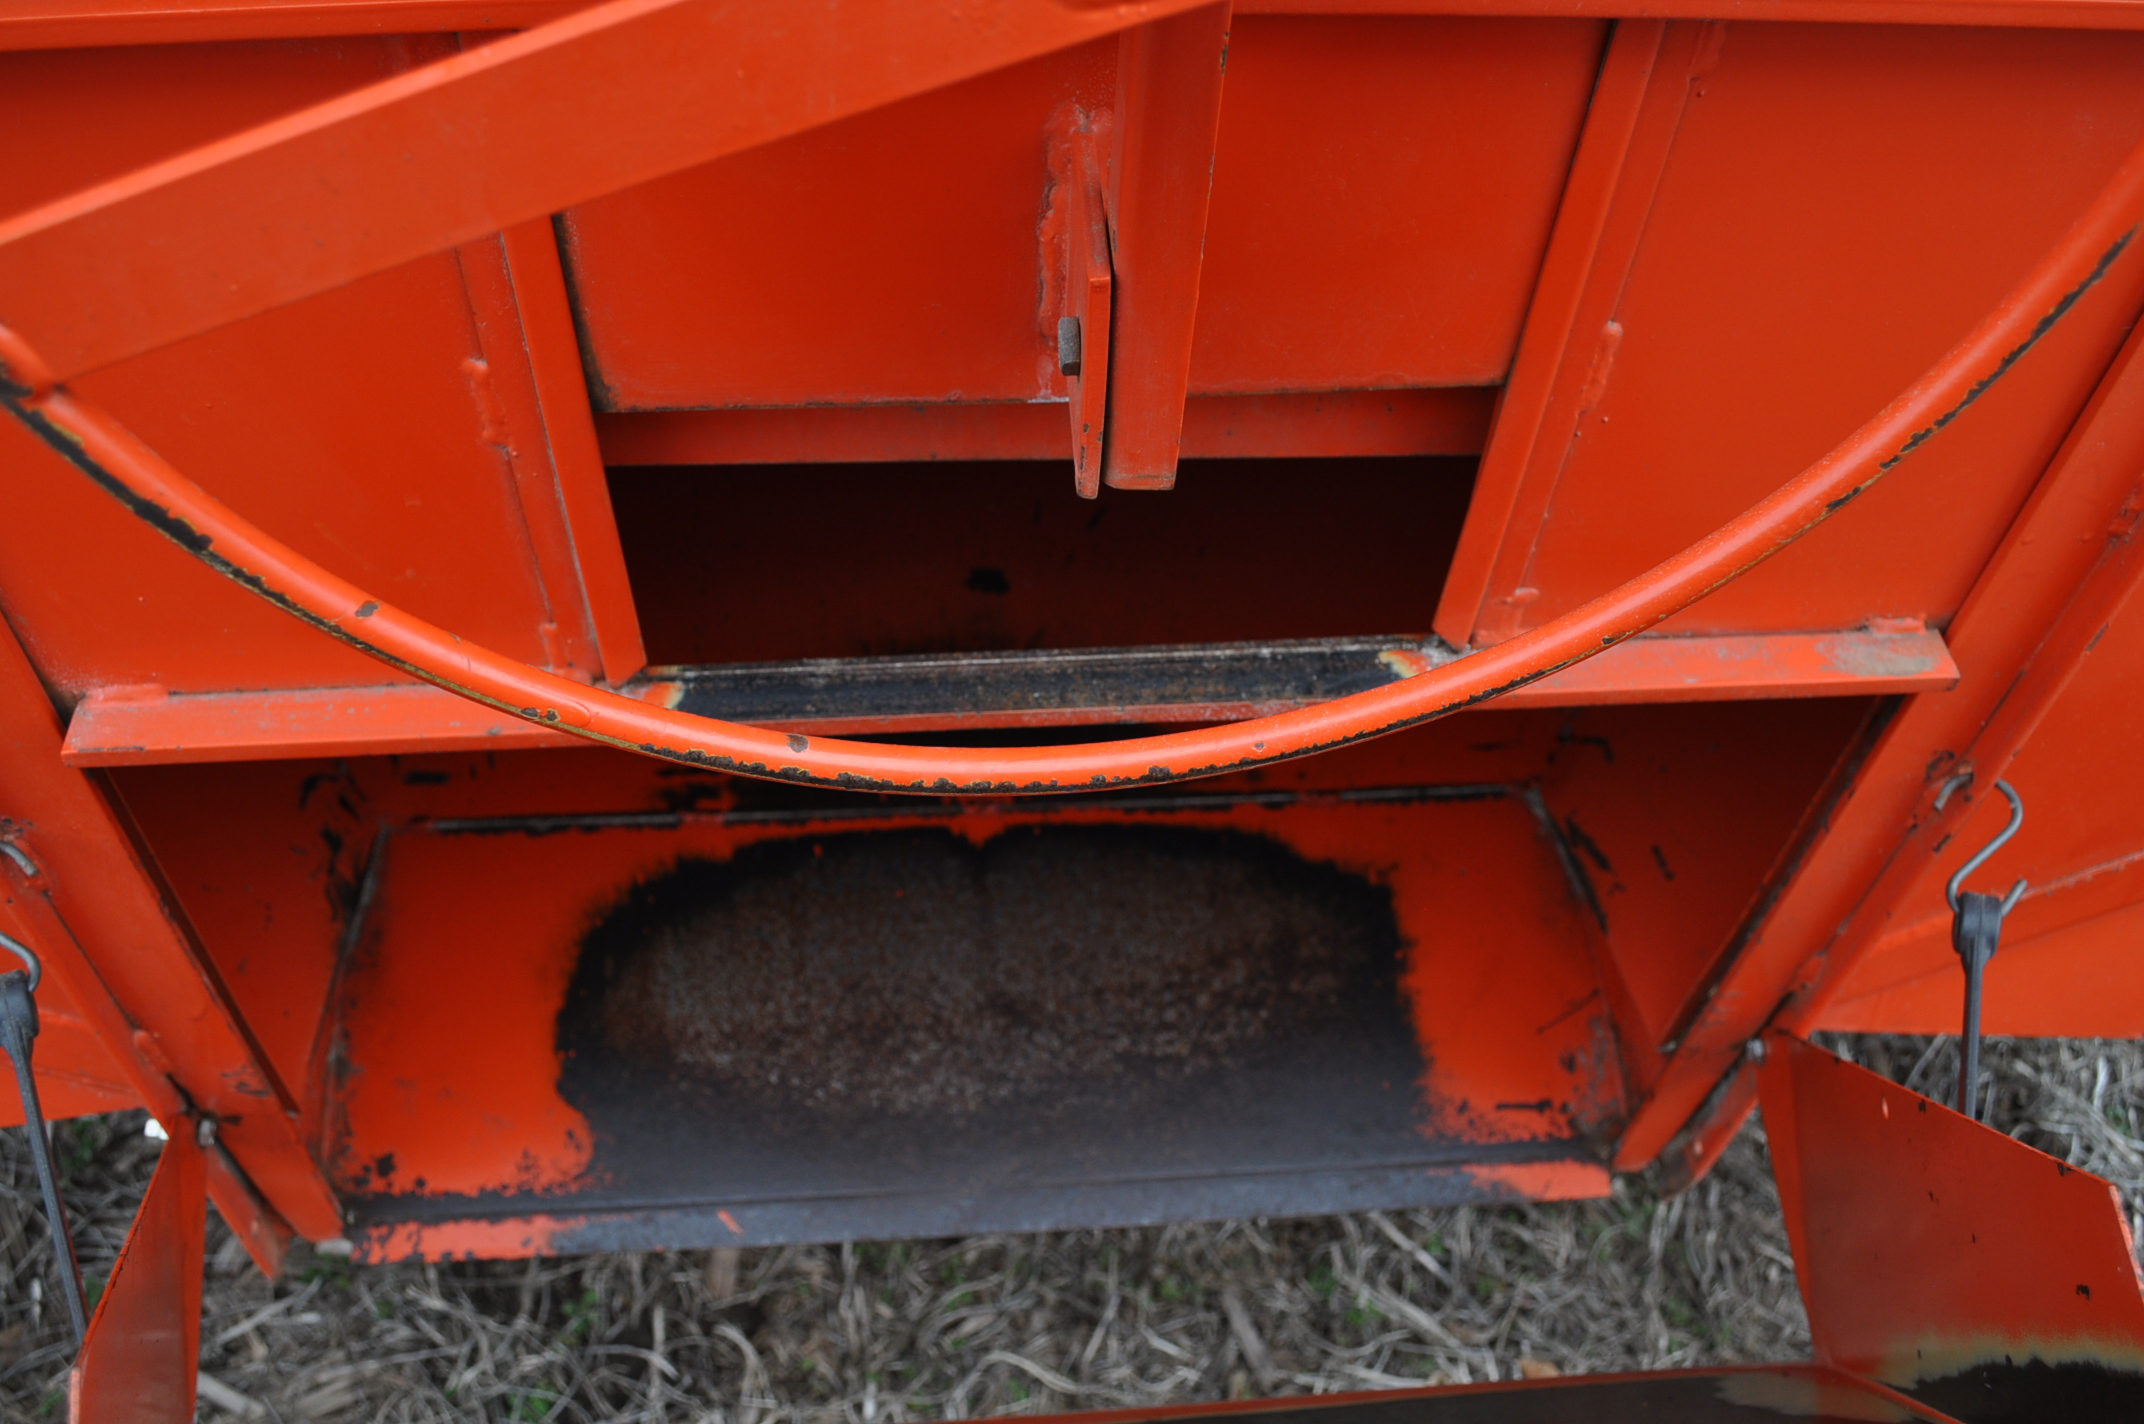 Killbros 385 gravity bed wagon, tarp, steel rails, Killbros 1386 gear, 11 R 22.5 tires - Image 7 of 7